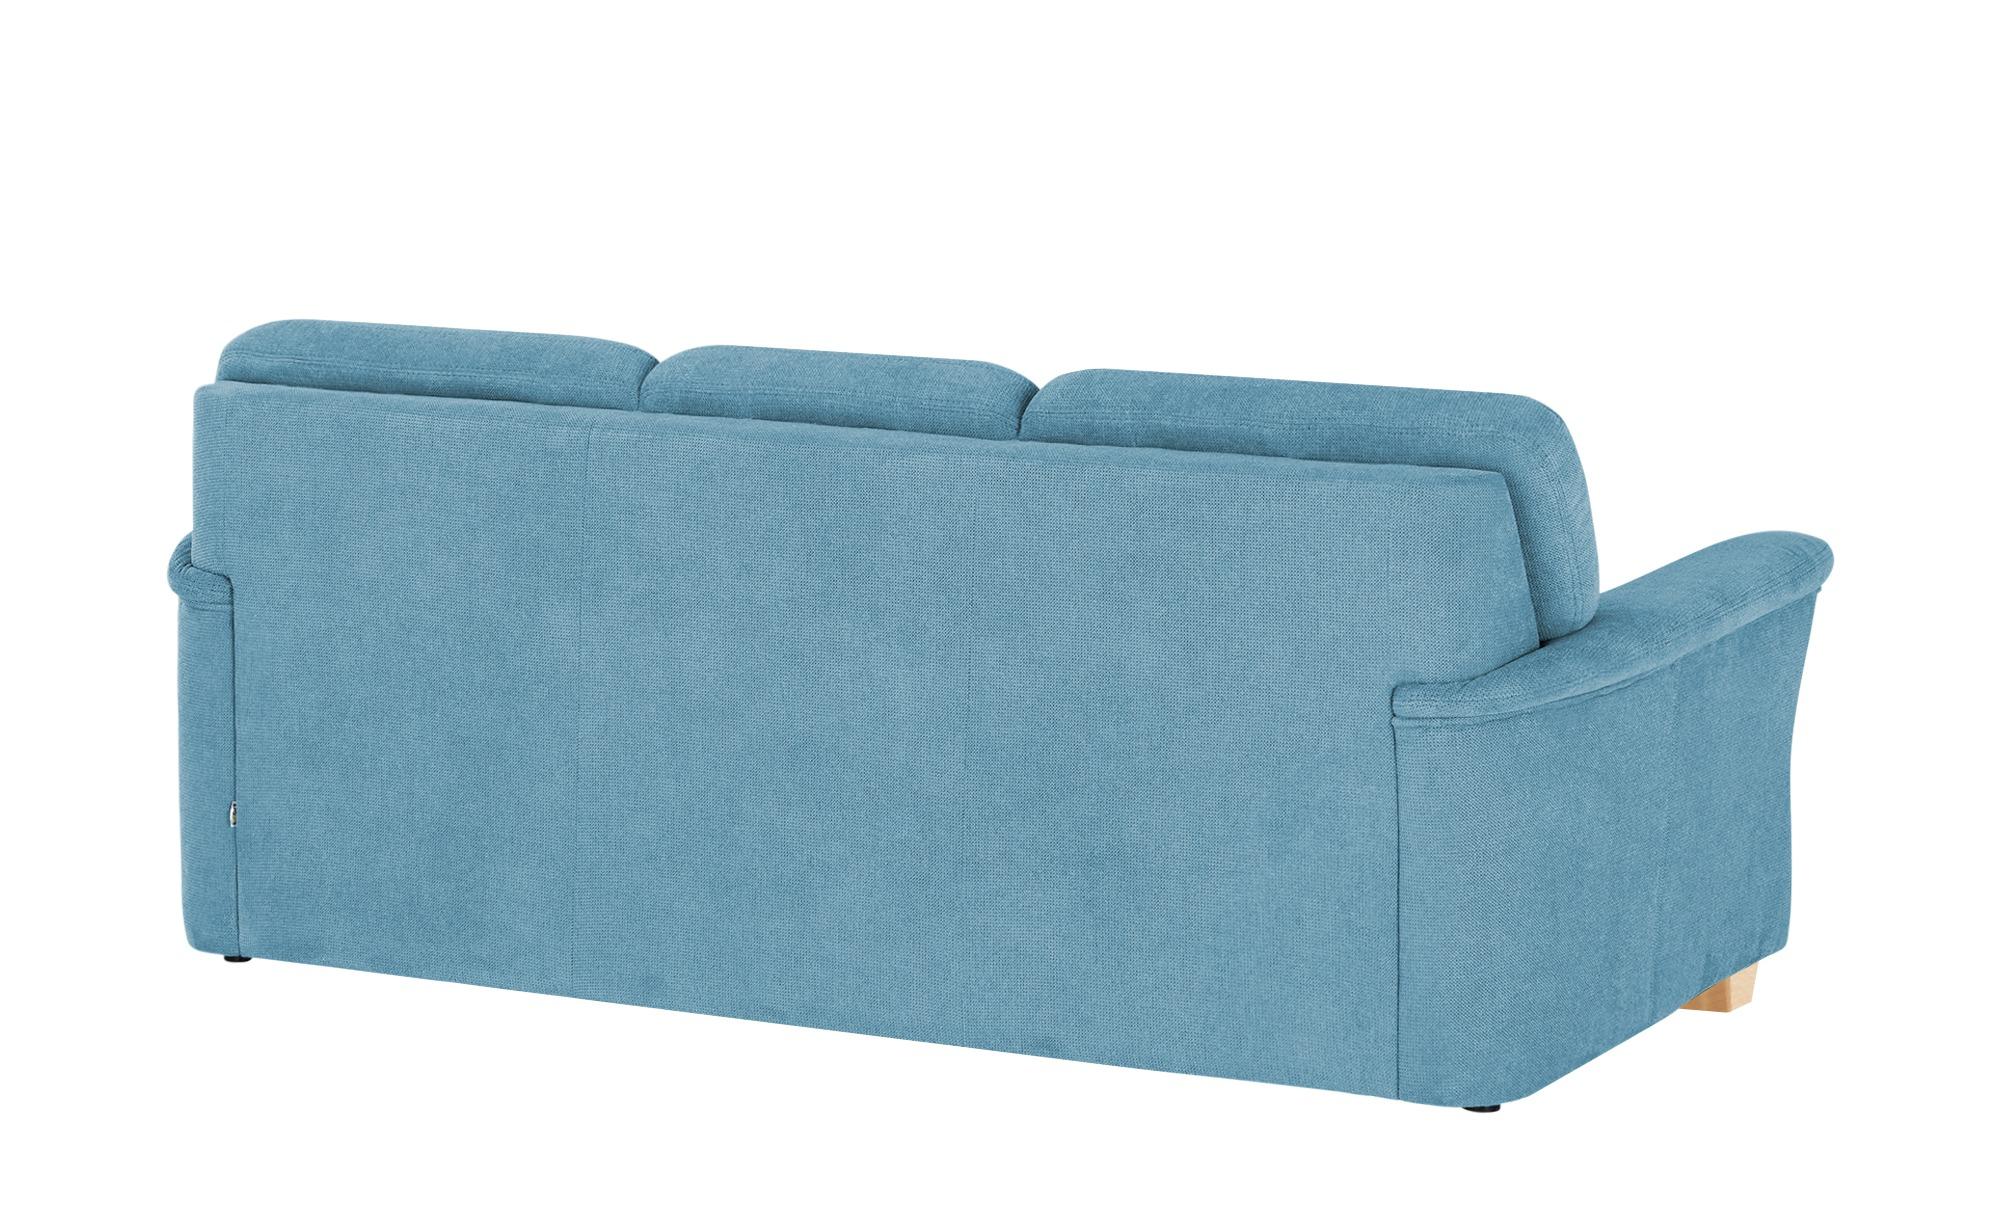 smart Sofa  Valencia ¦ blau ¦ Maße (cm): B: 224 H: 90 T: 93 Polstermöbel > Sofas > 3-Sitzer - Höffner